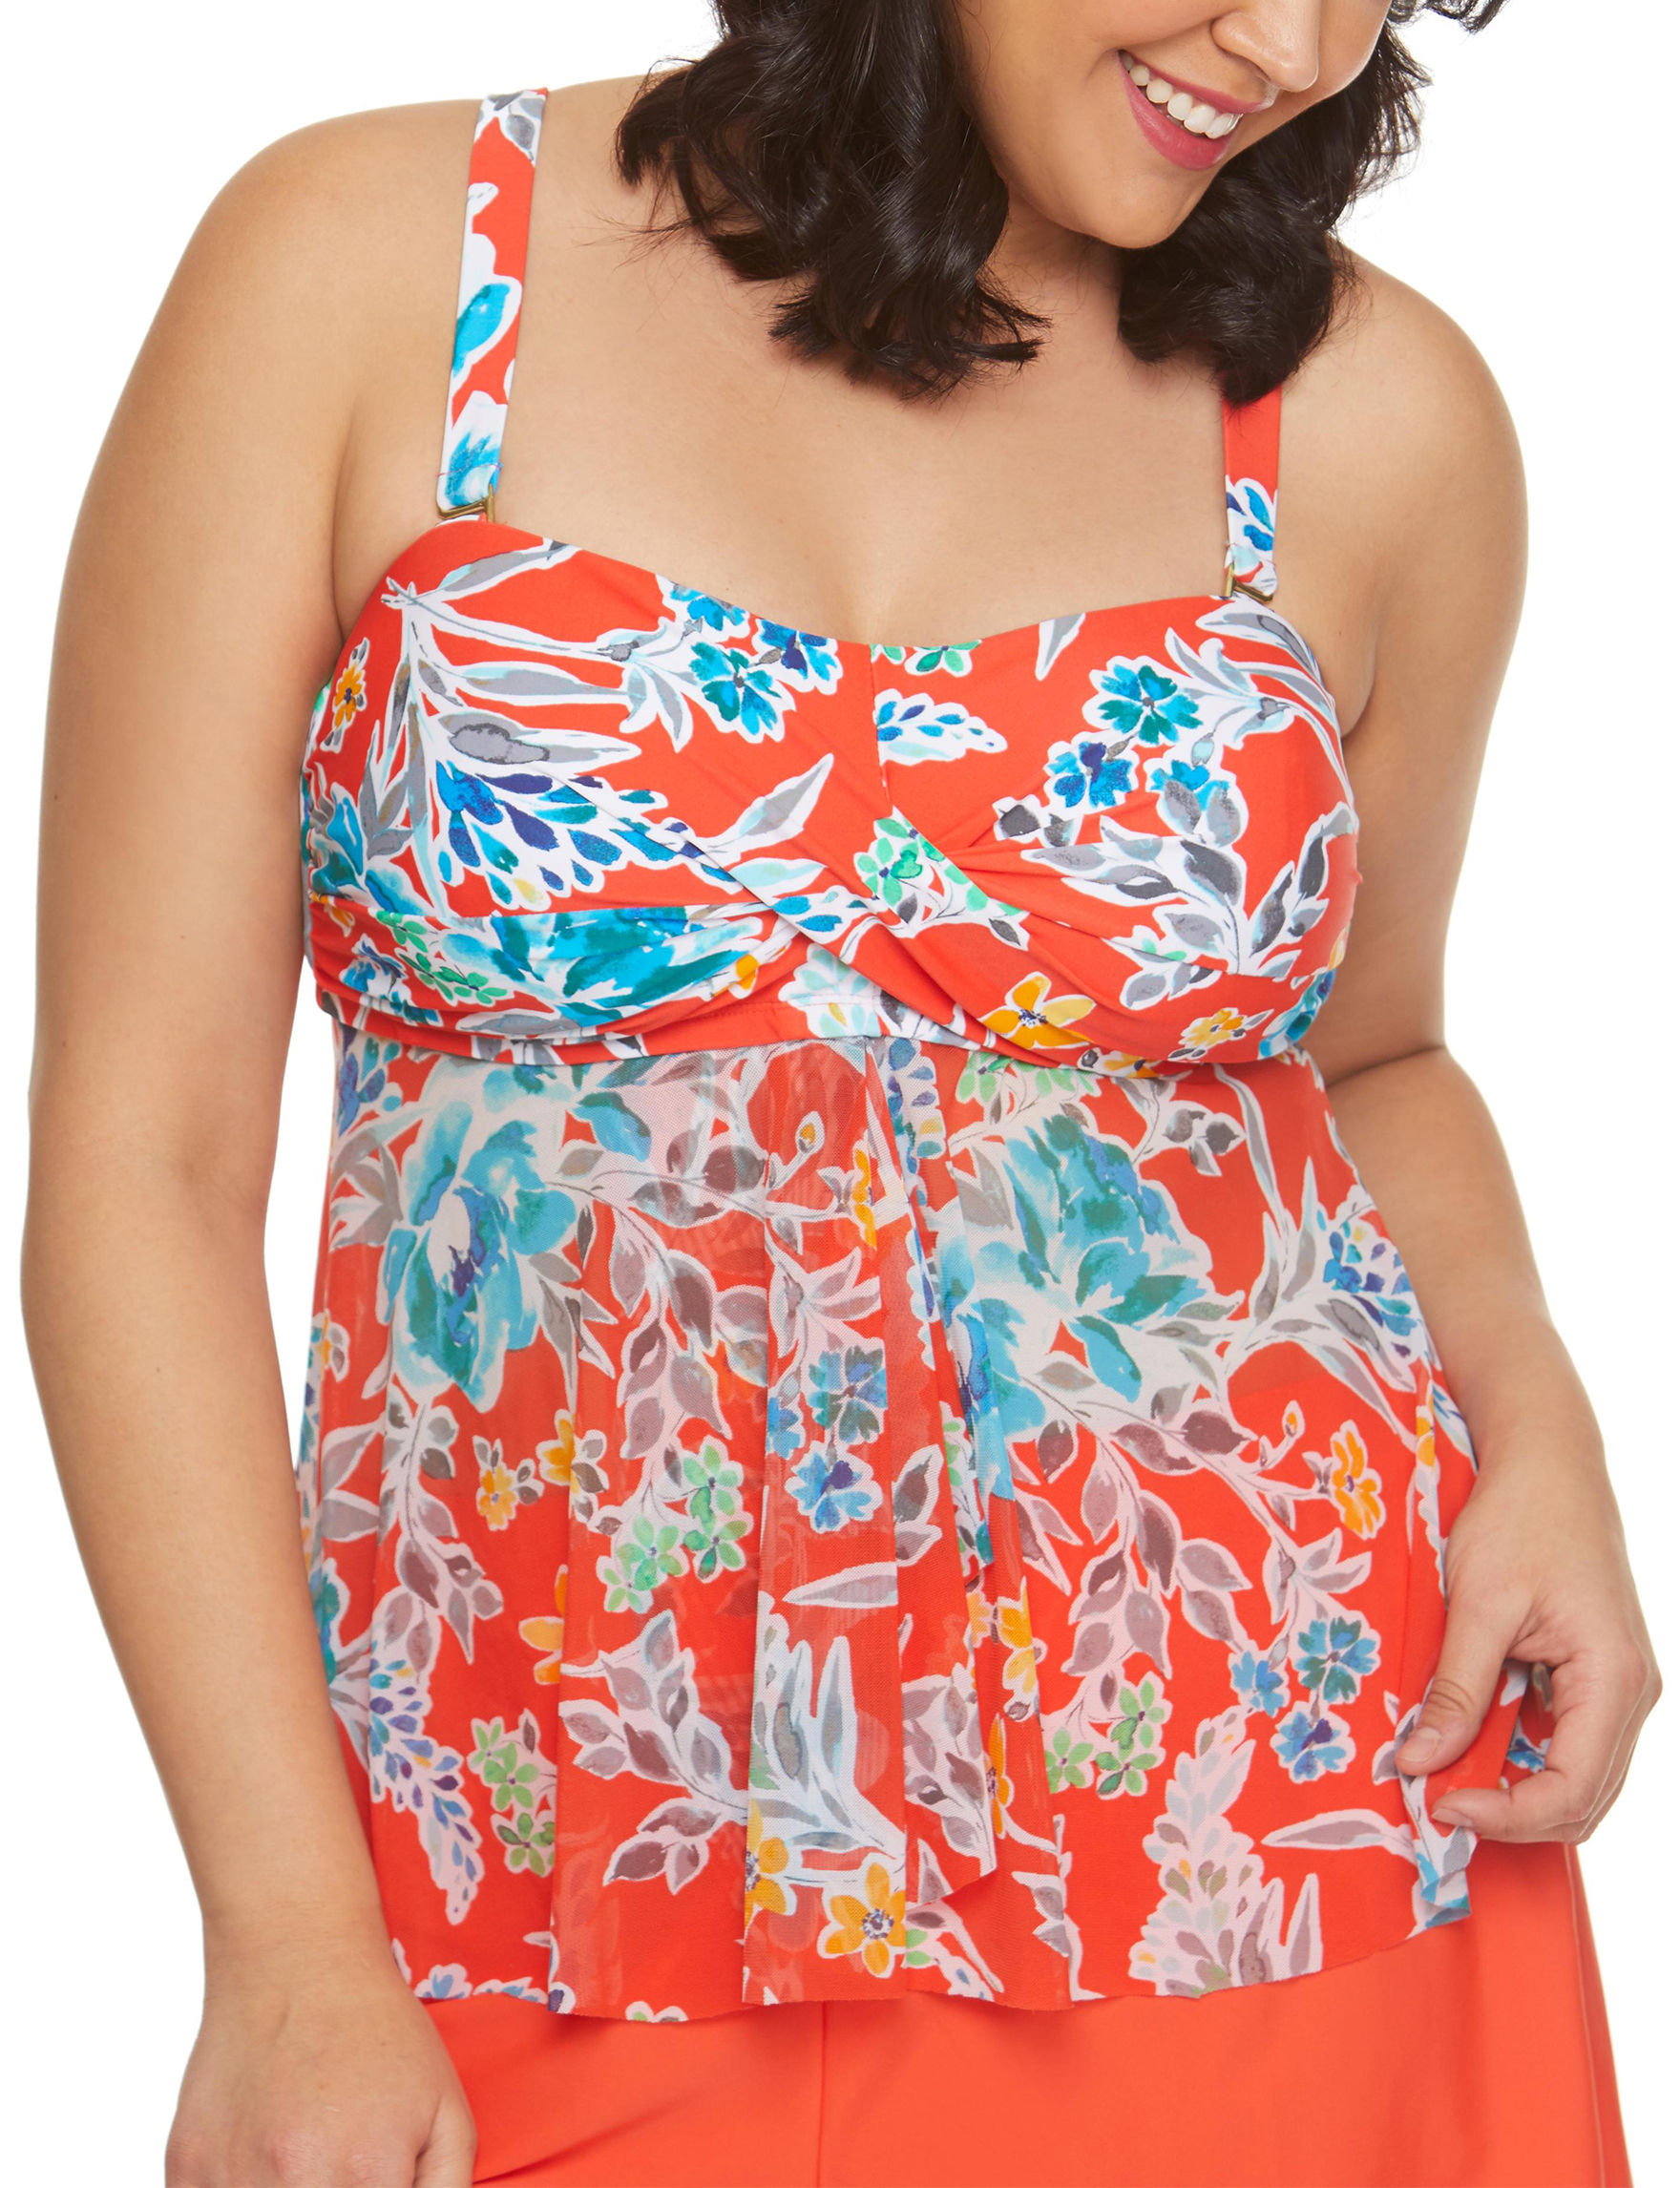 Beach Diva Orange Swimsuit Tops Bandeau Tankini